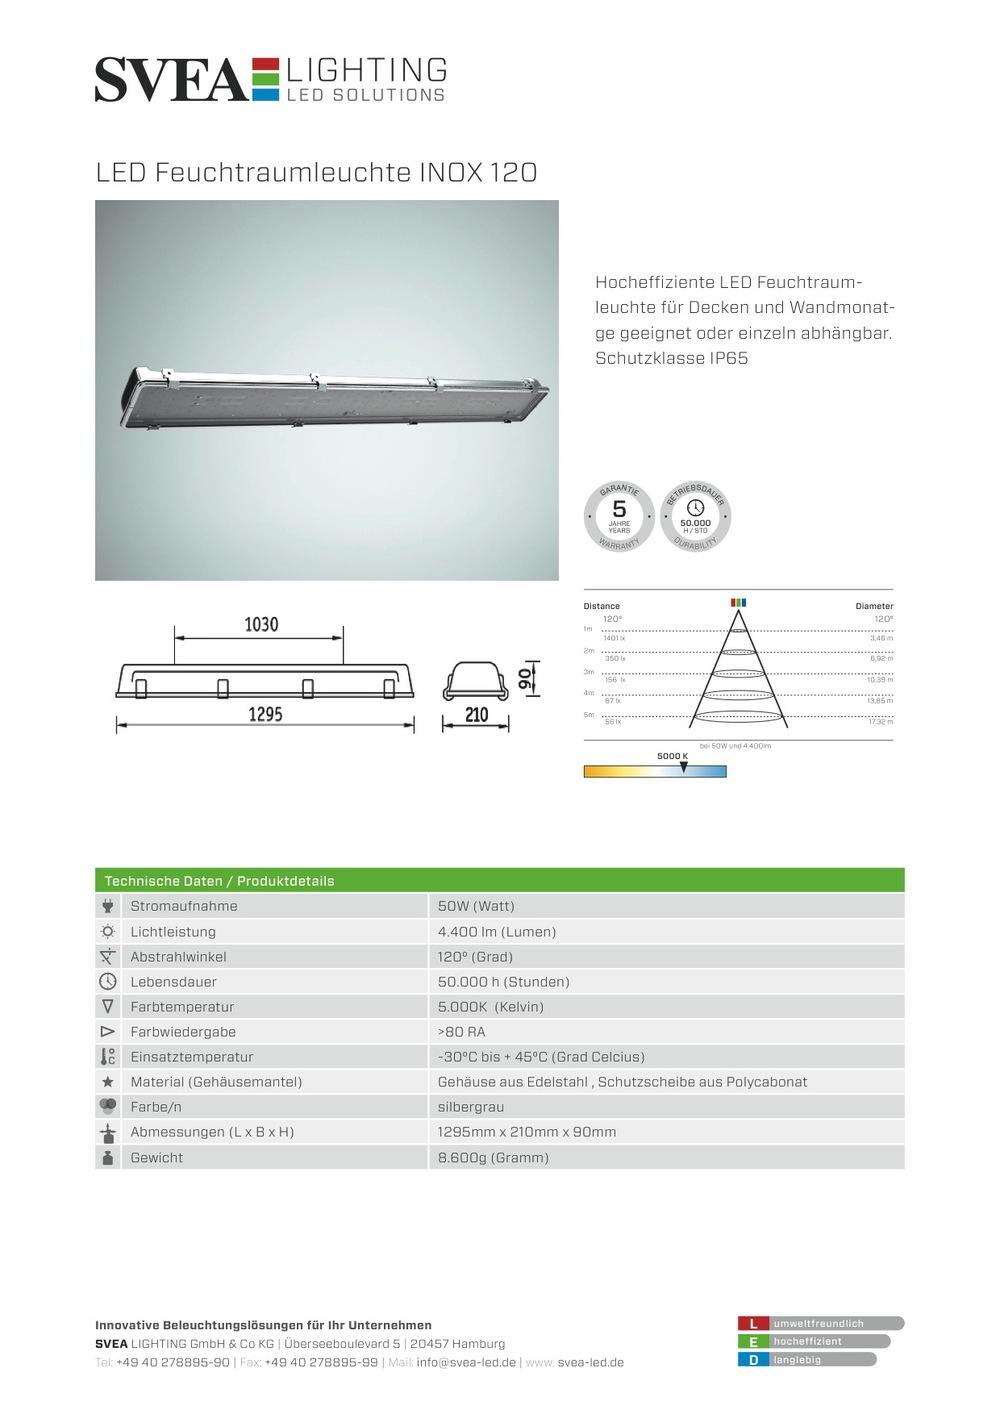 LED Feuchtraum INOX 120.jpg